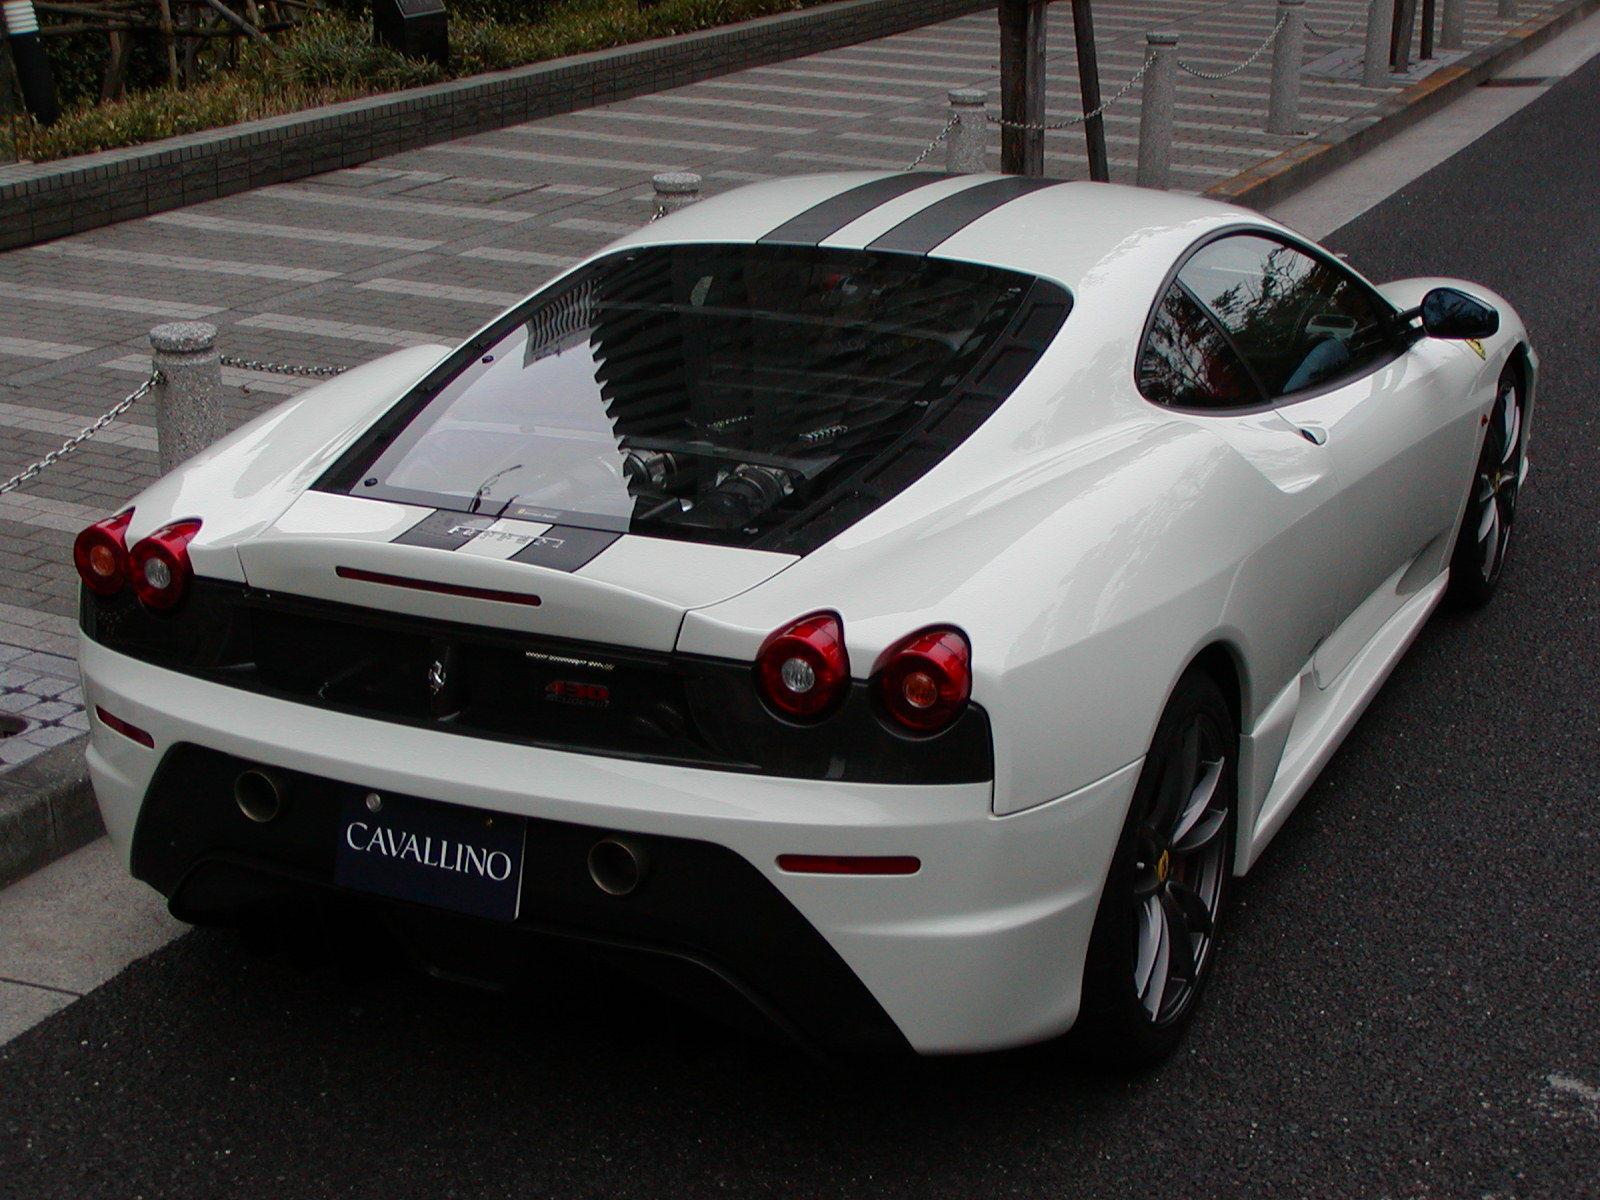 small Ferrari の造形の変化_a0129711_09474150.jpg